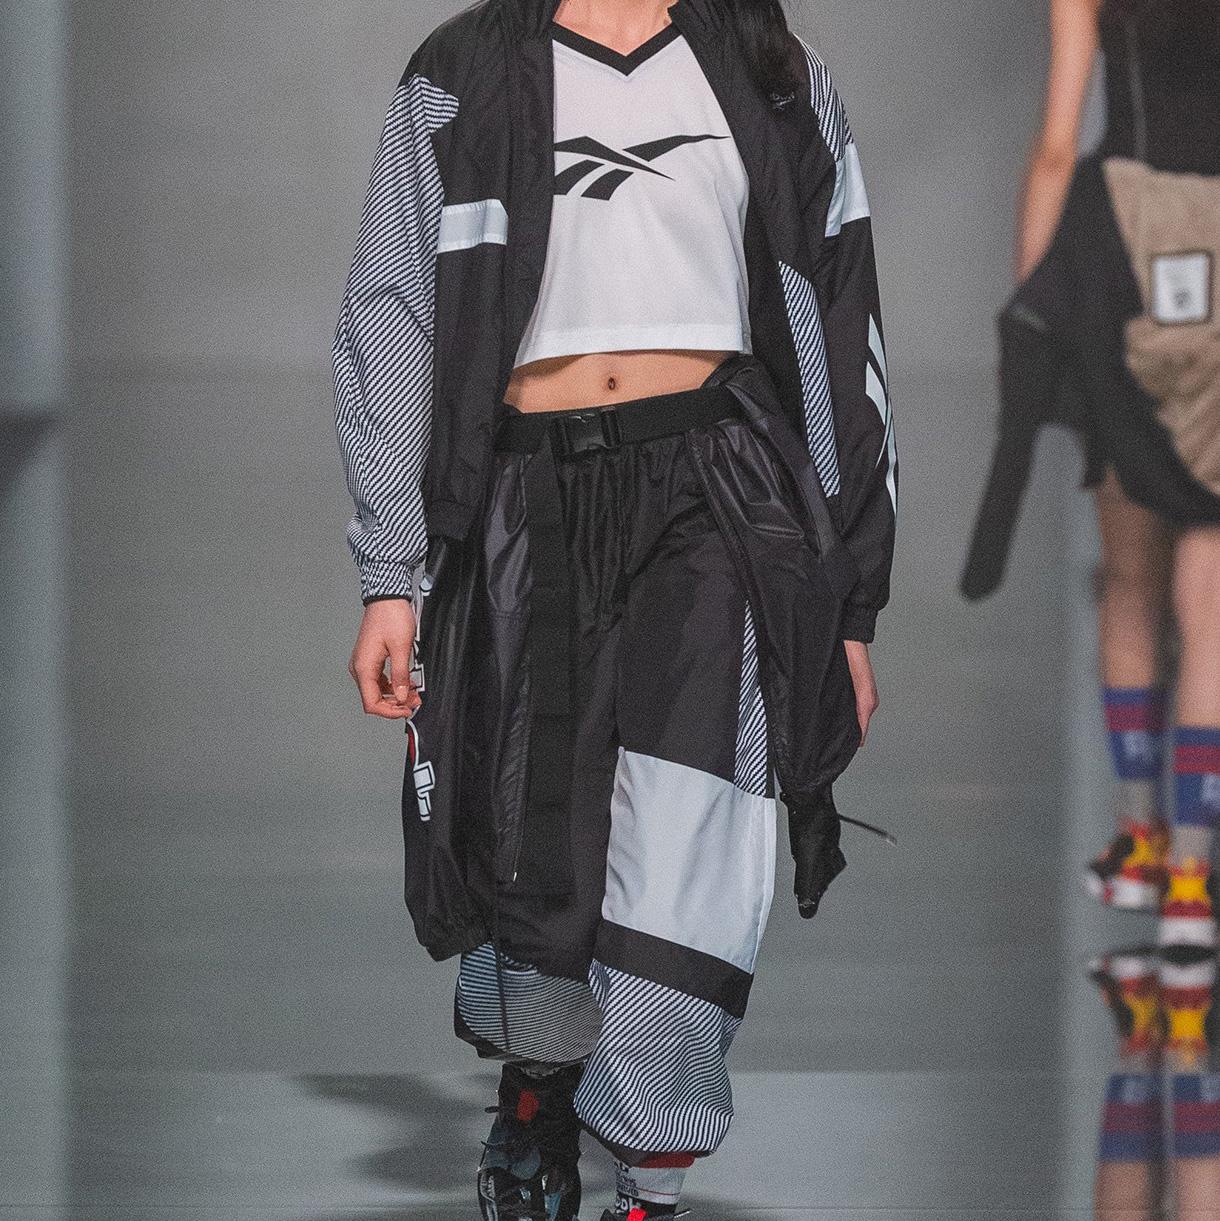 https---hypebeast.com-wp-content-blogs.dir-6-files-2019-03-reebok-advanced-concepts-sole-fury-shanghai-fashion-week-3.jpg